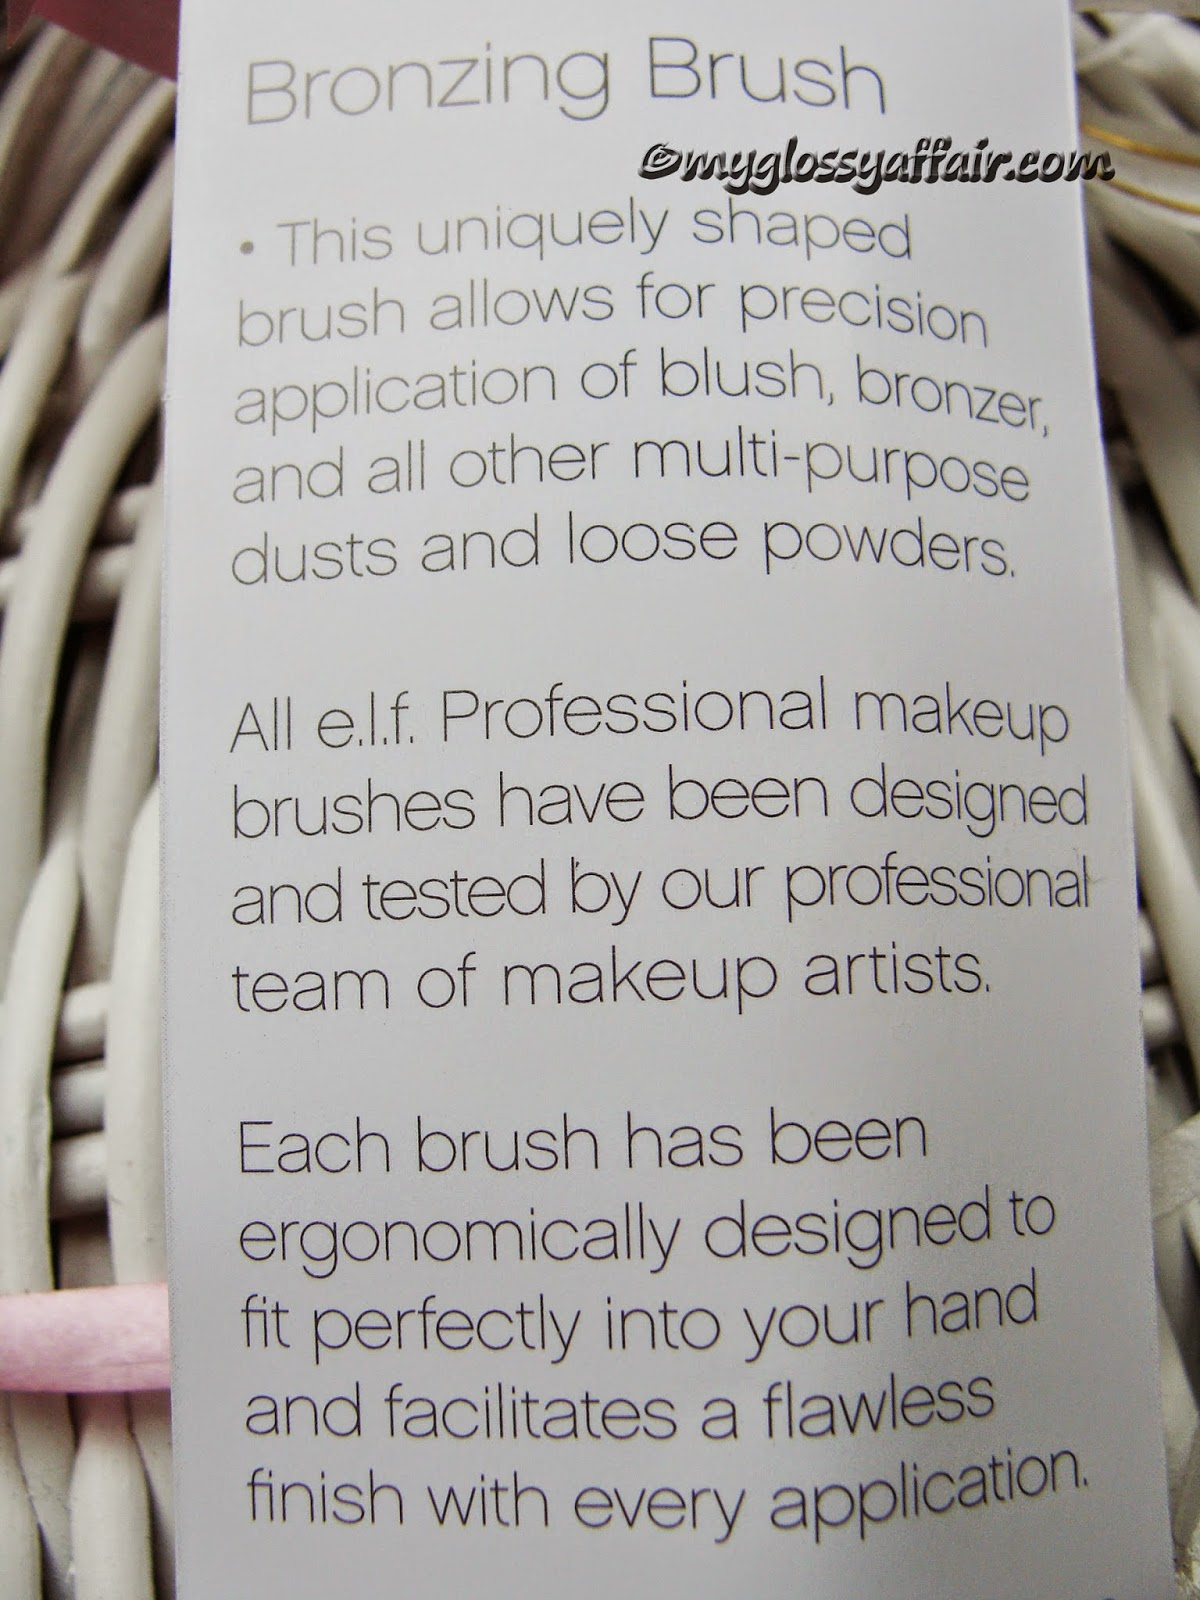 Elf Professional Bronzing Brush Review